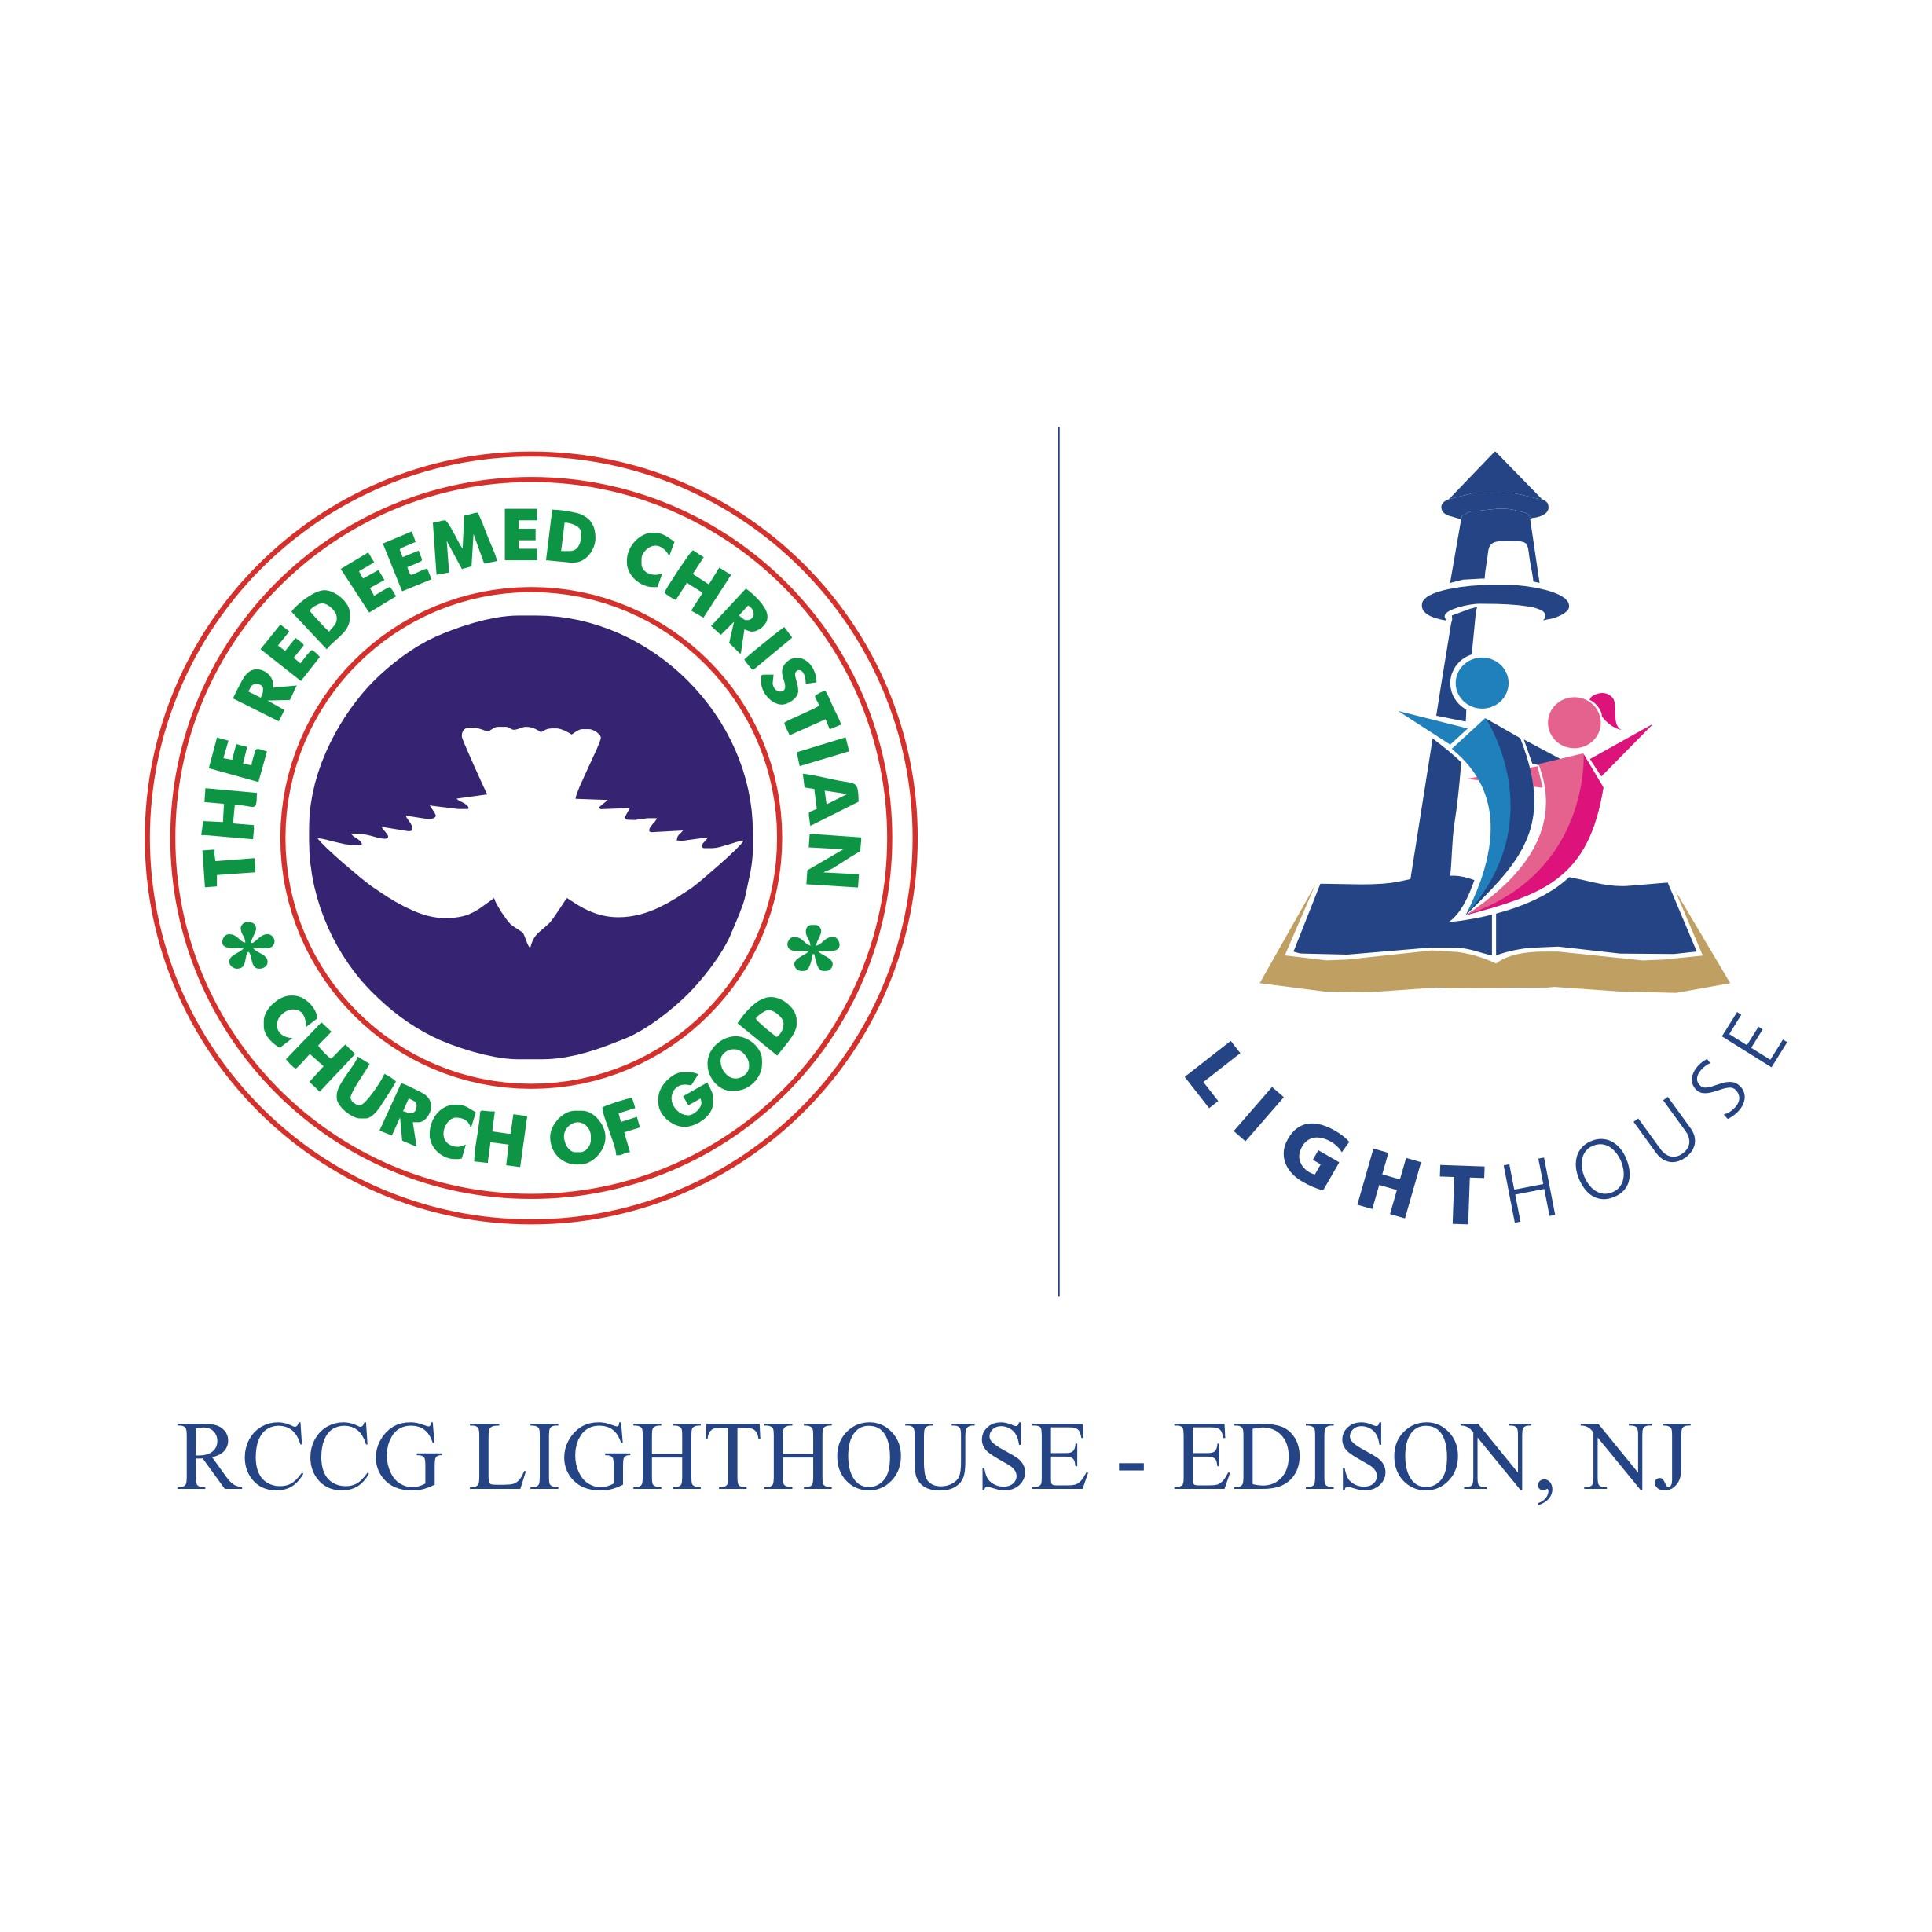 Anatomy of the Spirit – RCCG Lighthouse Edison